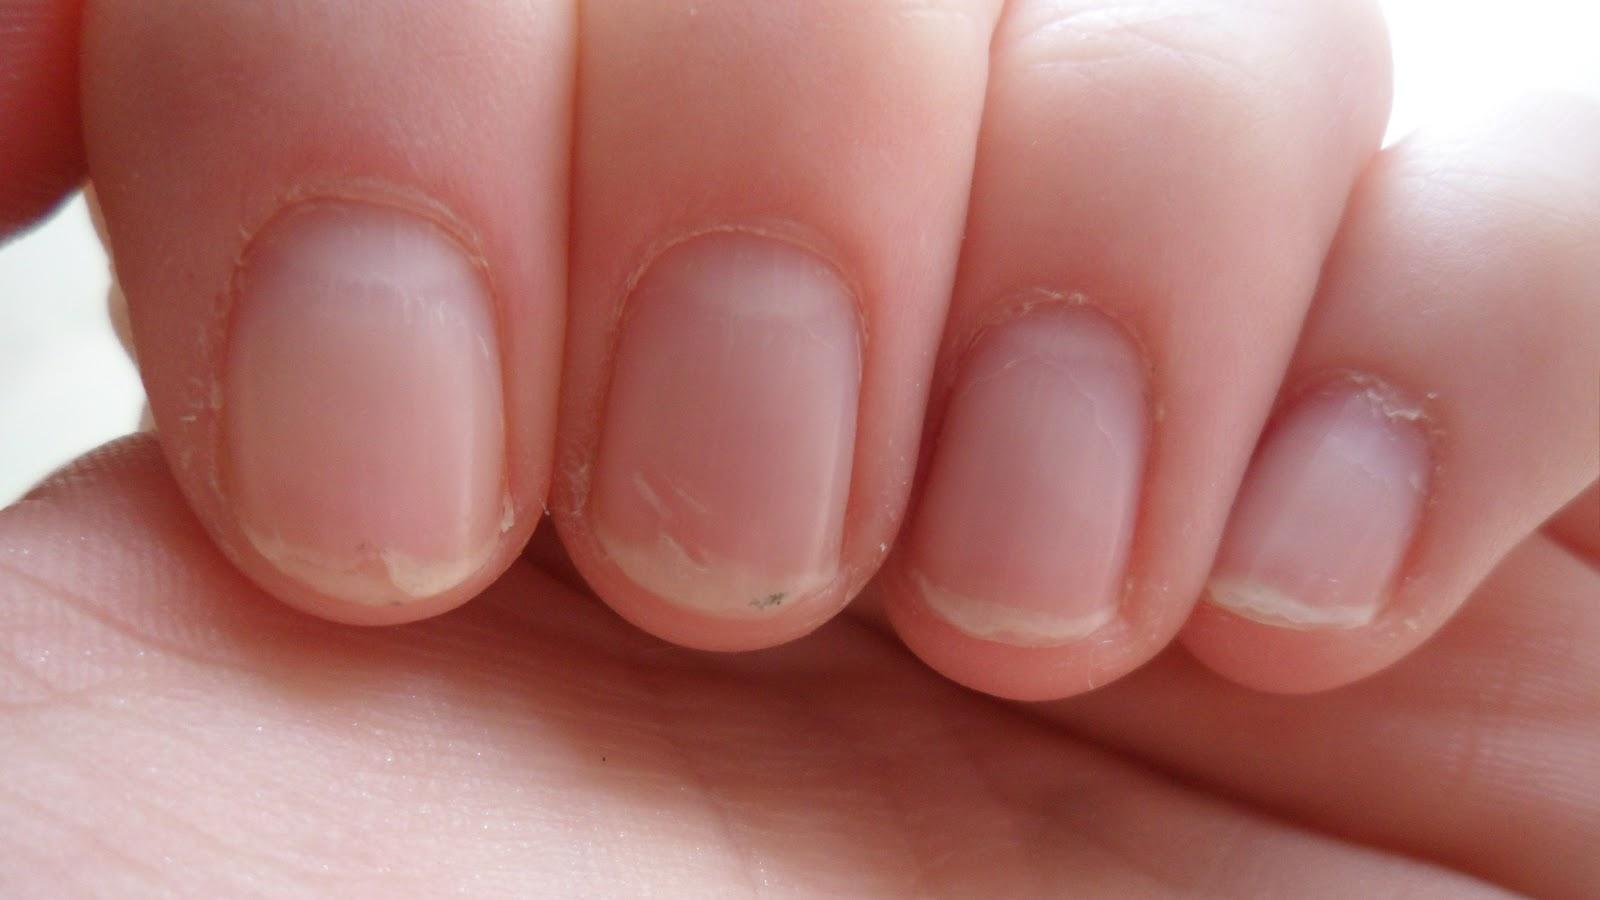 Cornish Beauty: How to Fix Damaged Nails ft. OPI